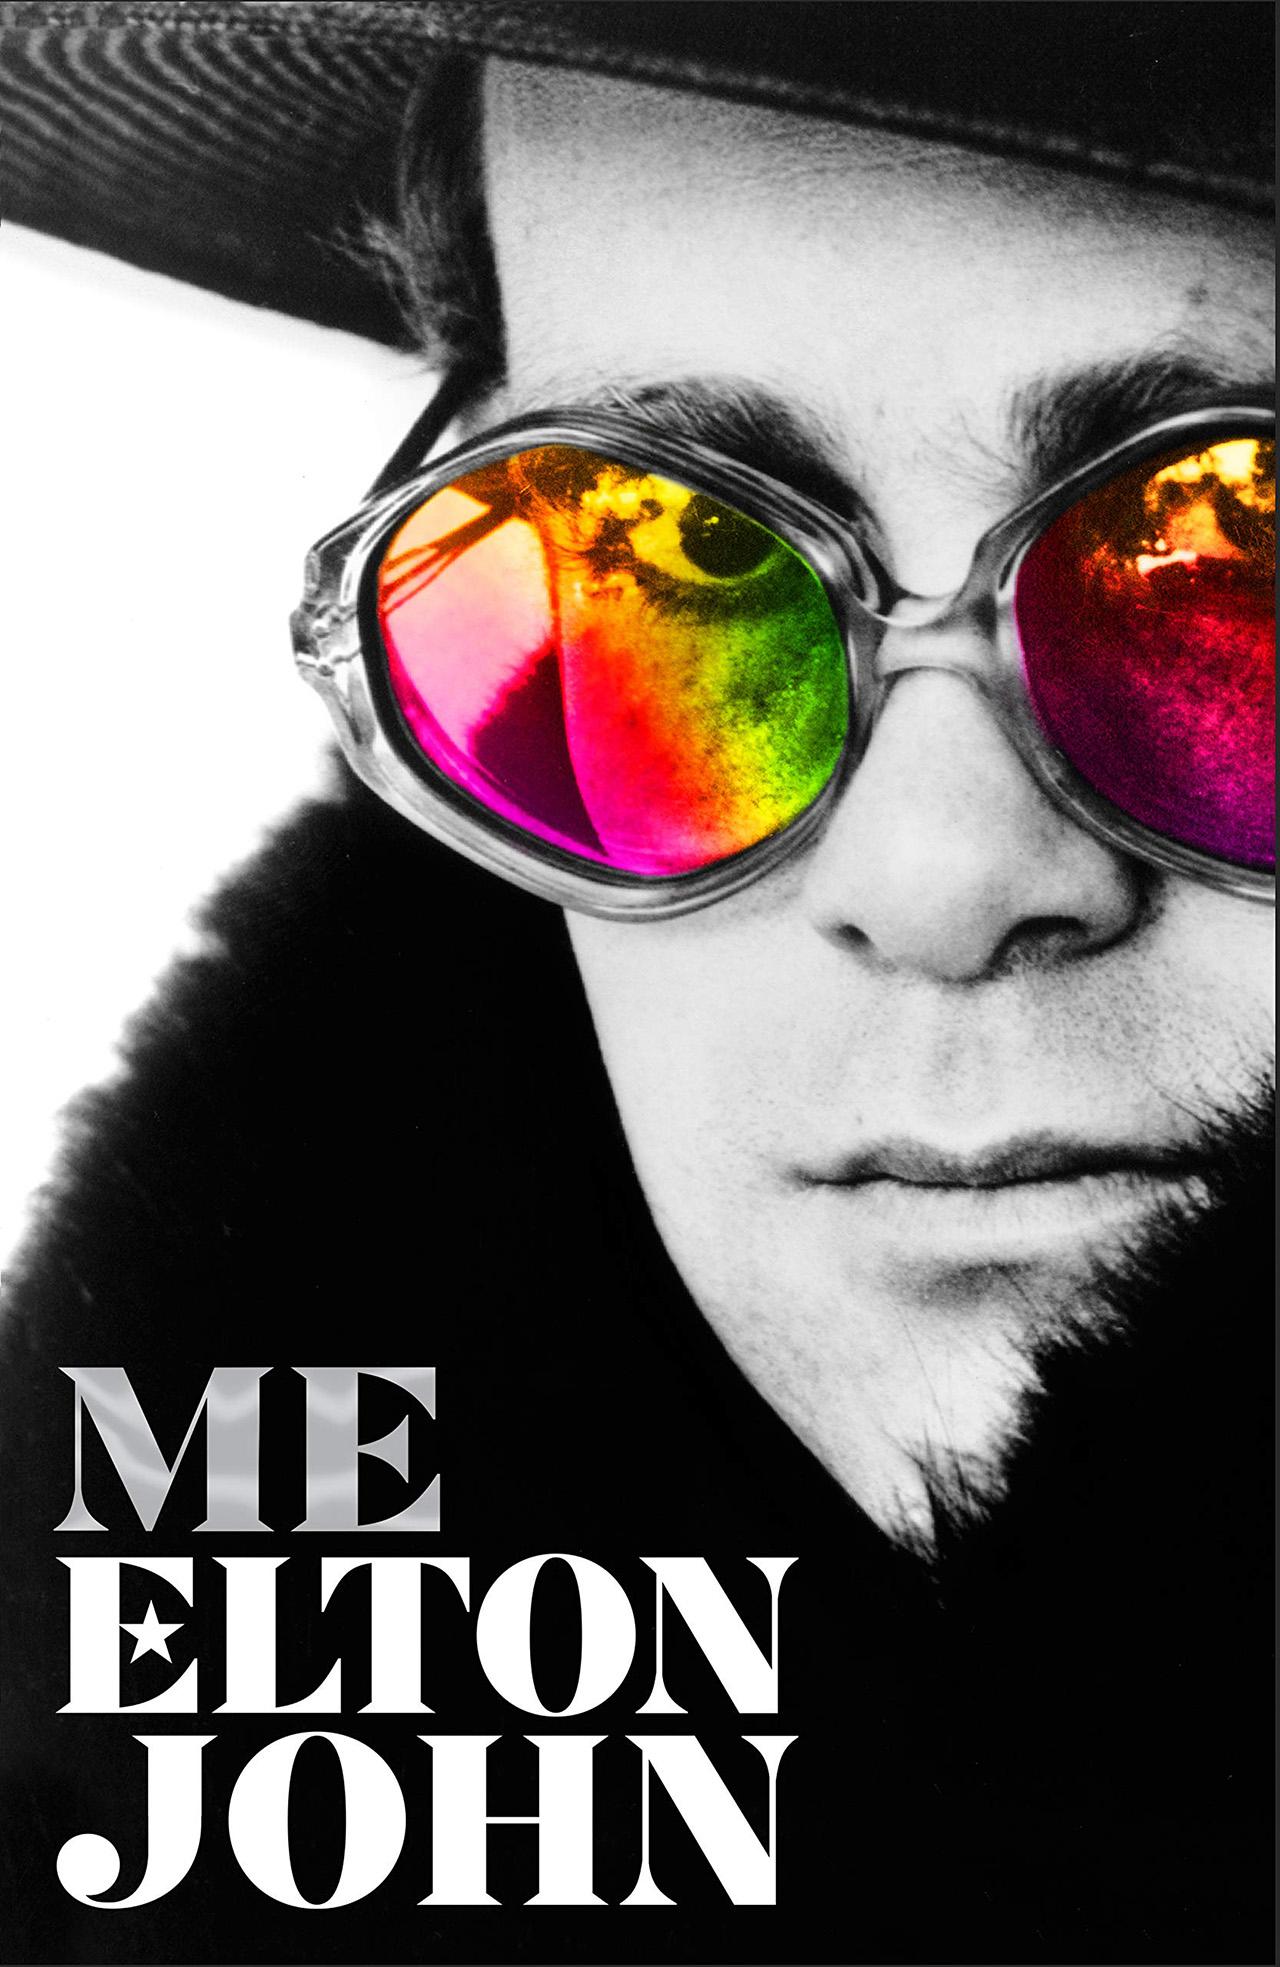 Rocketman star Taron Egerton to narrate Elton John audiobook | Louder